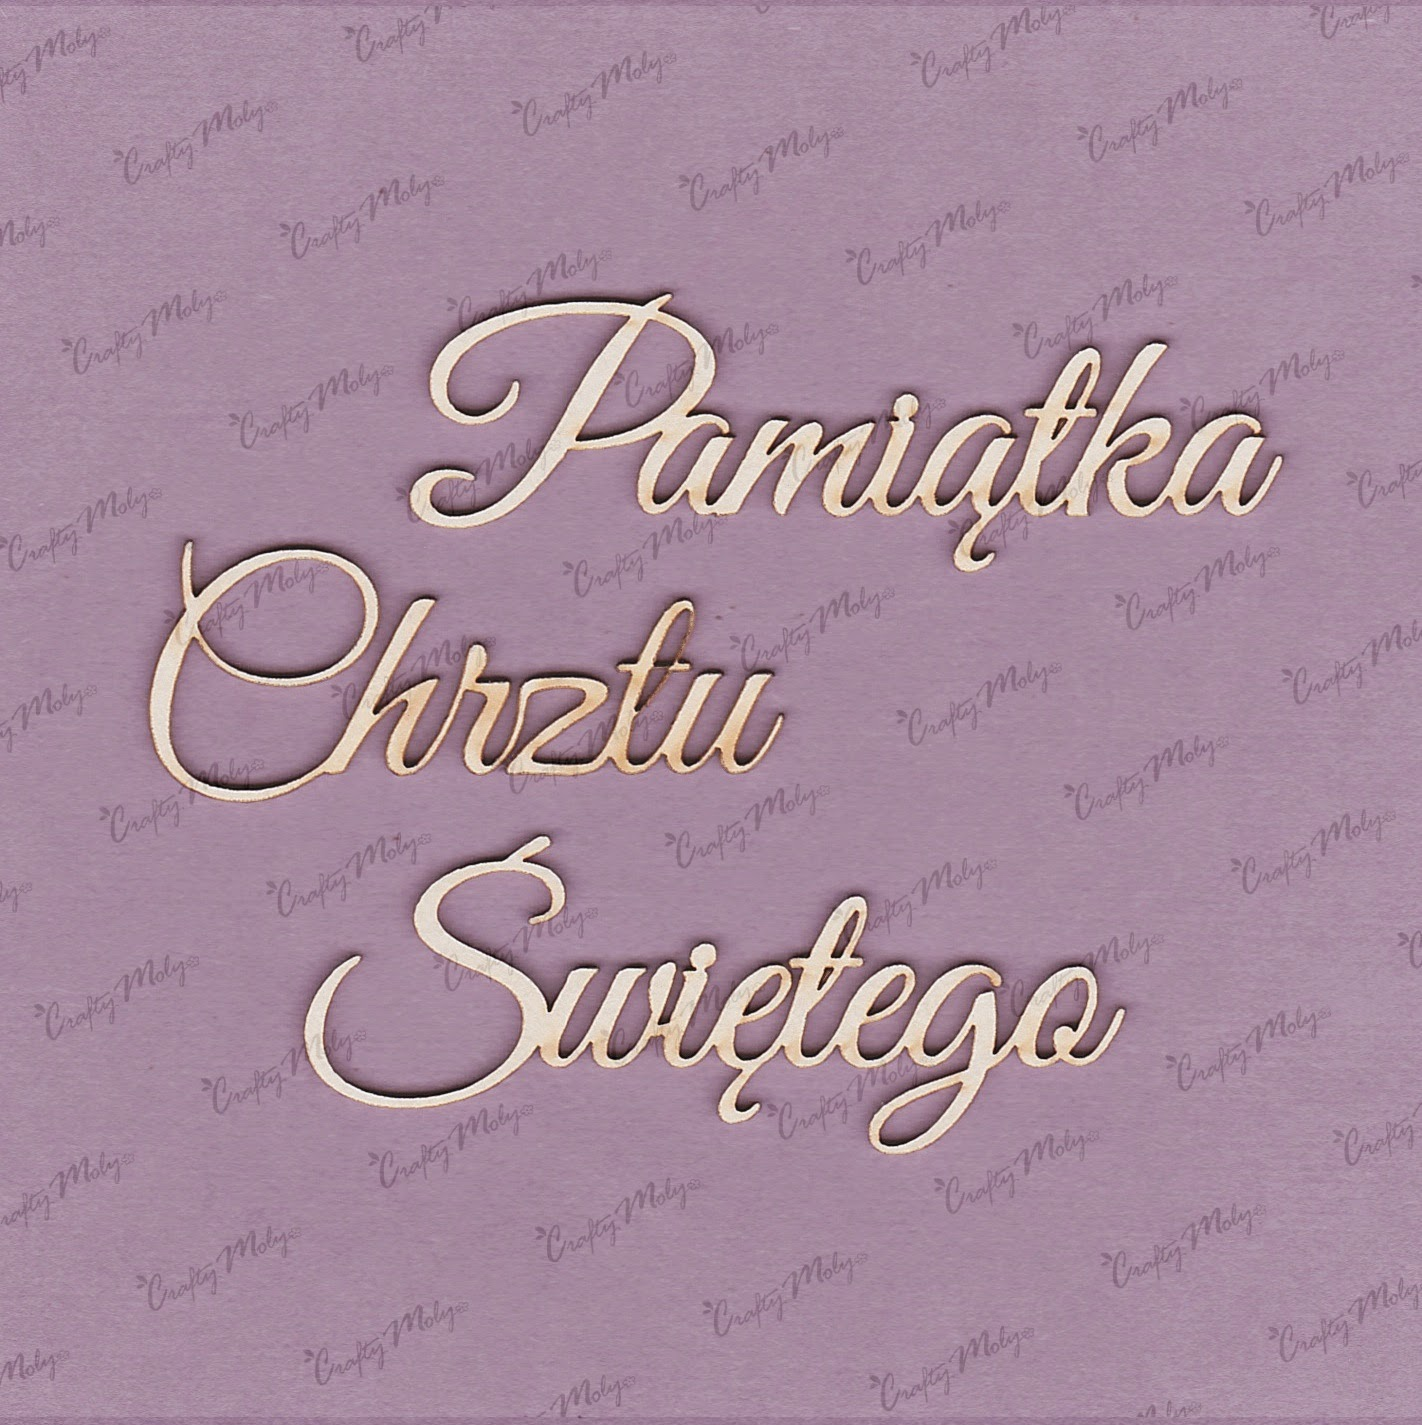 http://sklepik.na-strychu.pl/pl/p/Tekturka-napis-Pamiatka-Chrztu-sw.-duza-438d-CM/15568